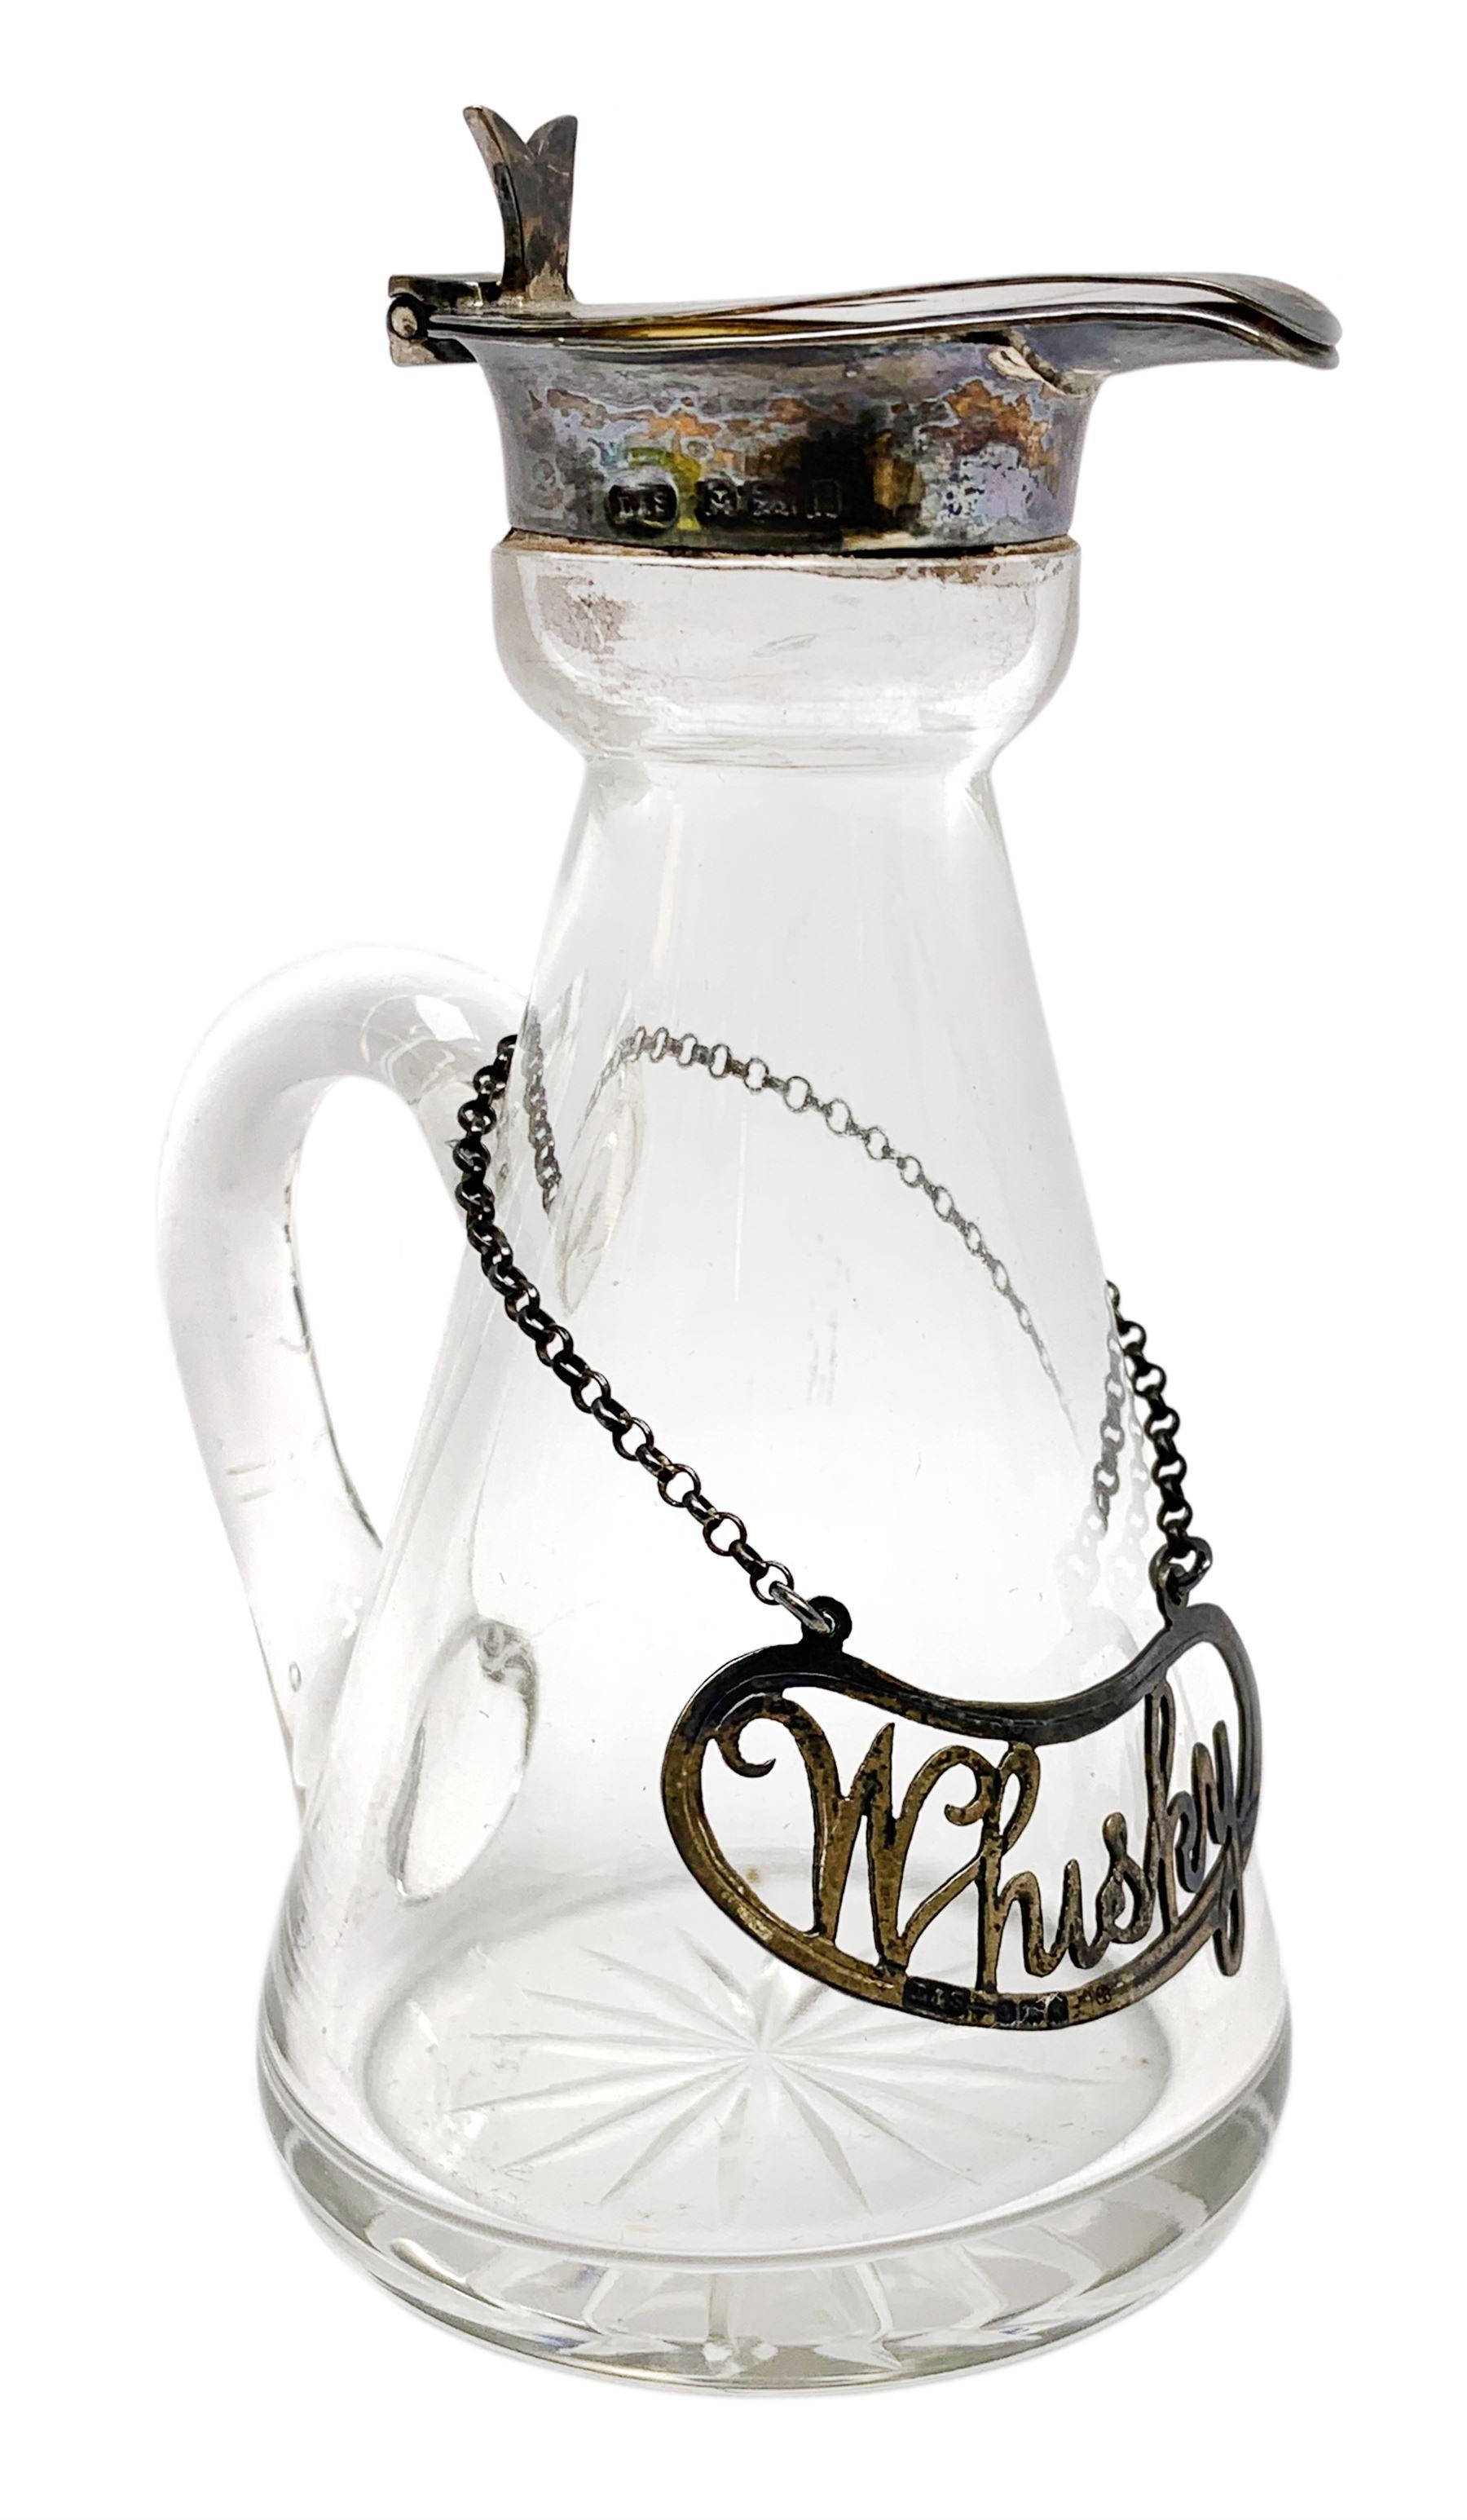 Edwardian silver mounted whisky noggin